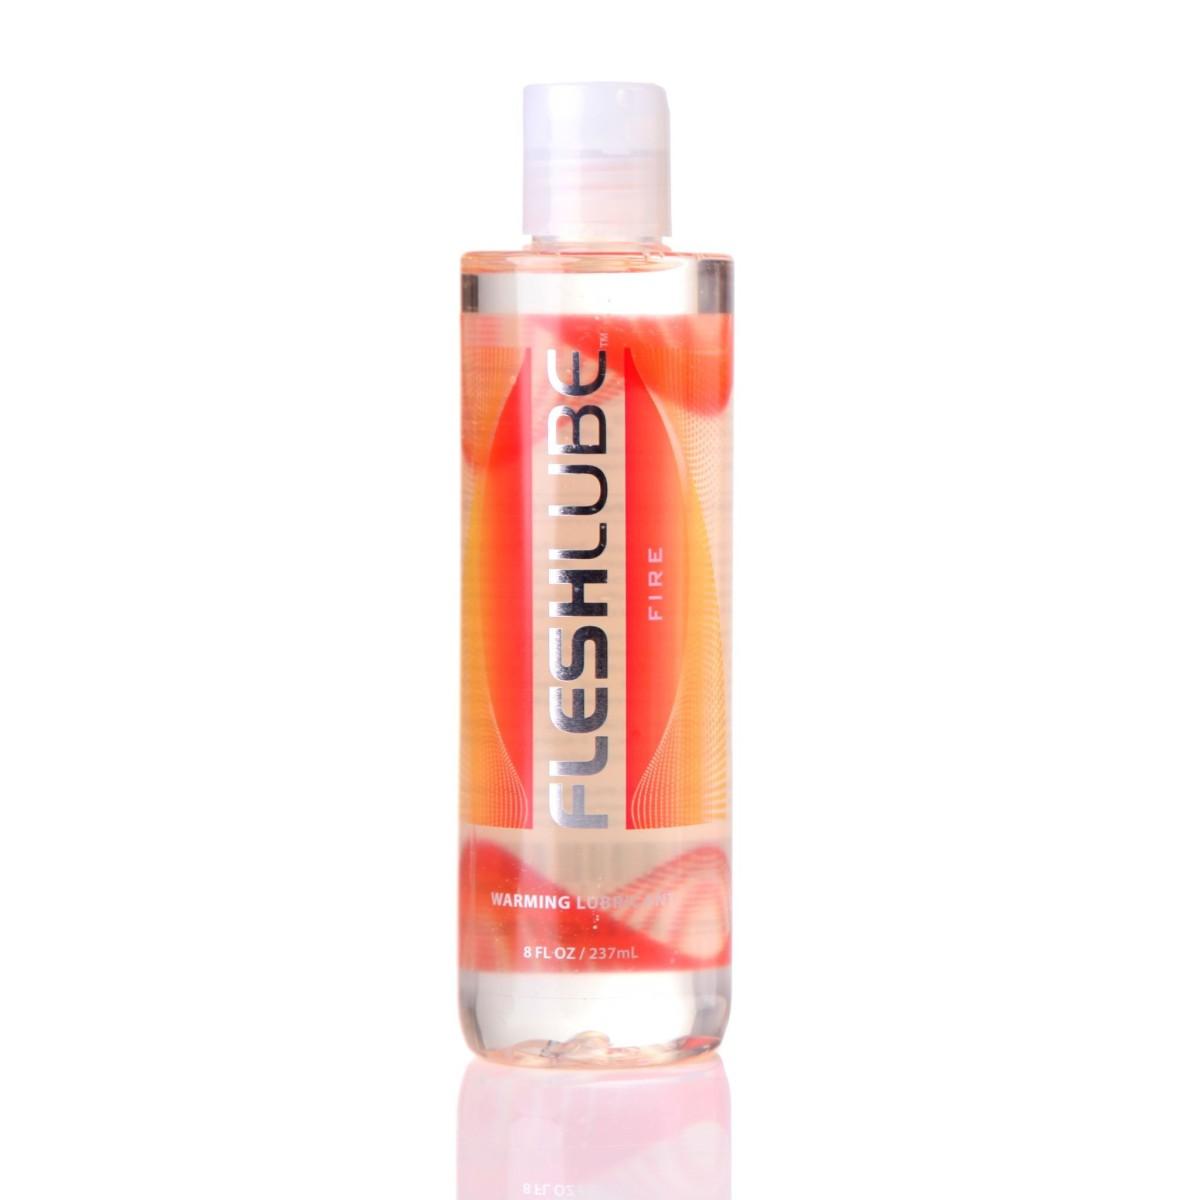 Fleshlight Fleshlube Fire 250 ml, lubrikant na vodní bázi